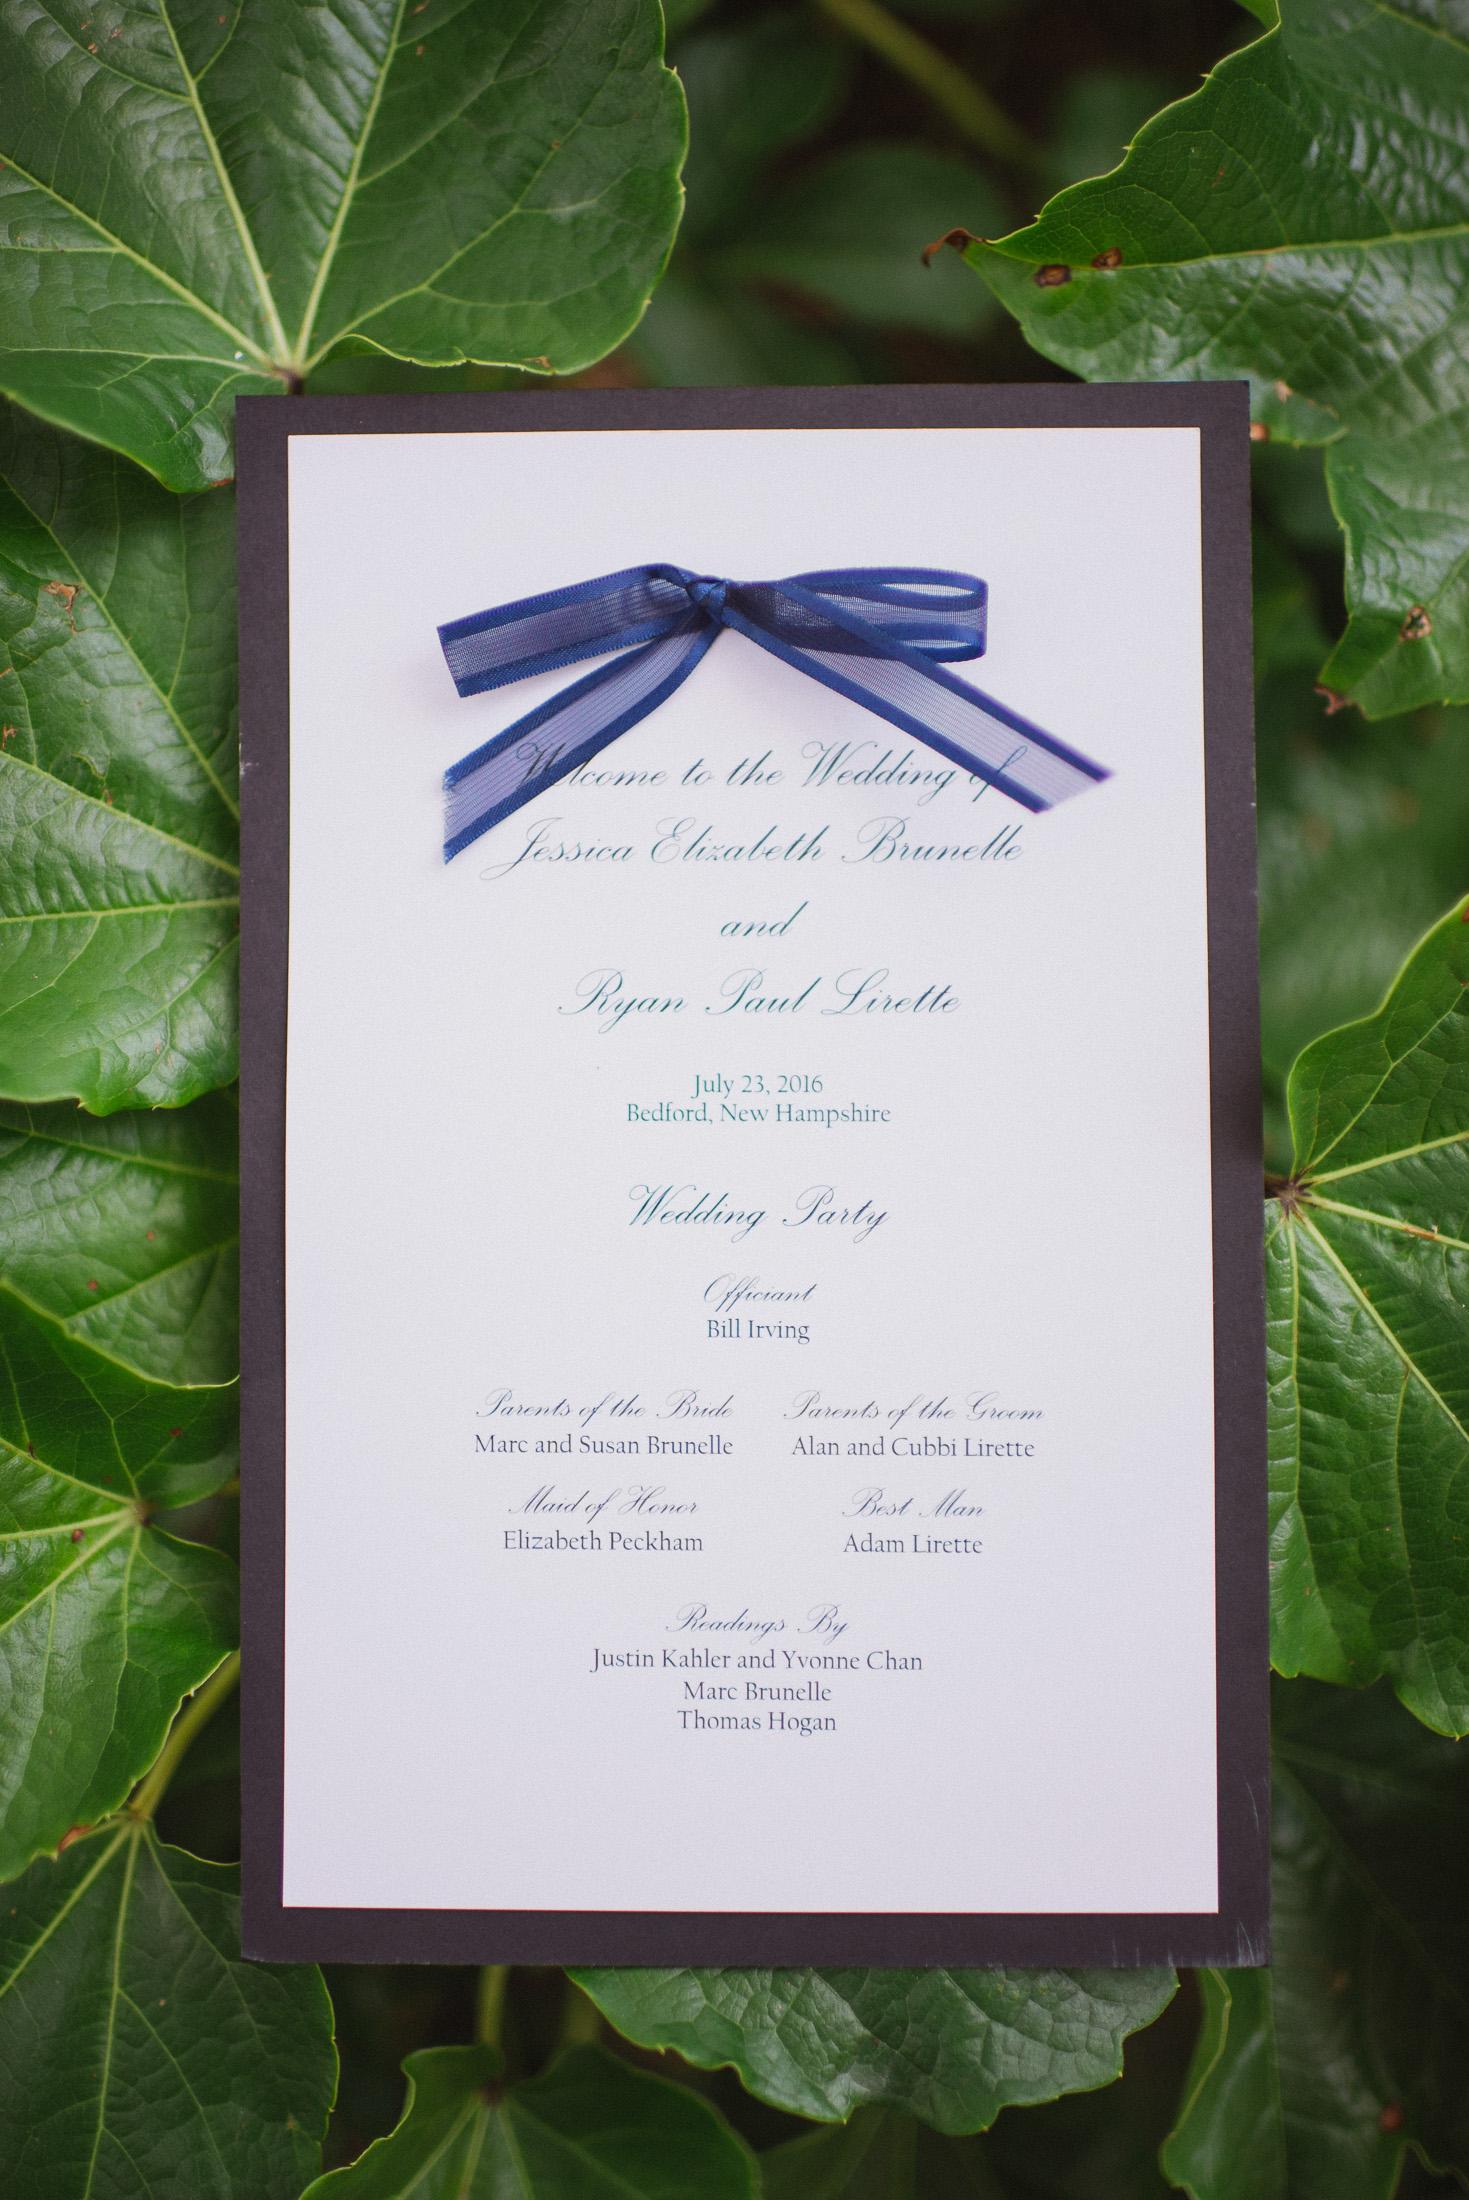 NH Wedding Photographer: invitation to BVI